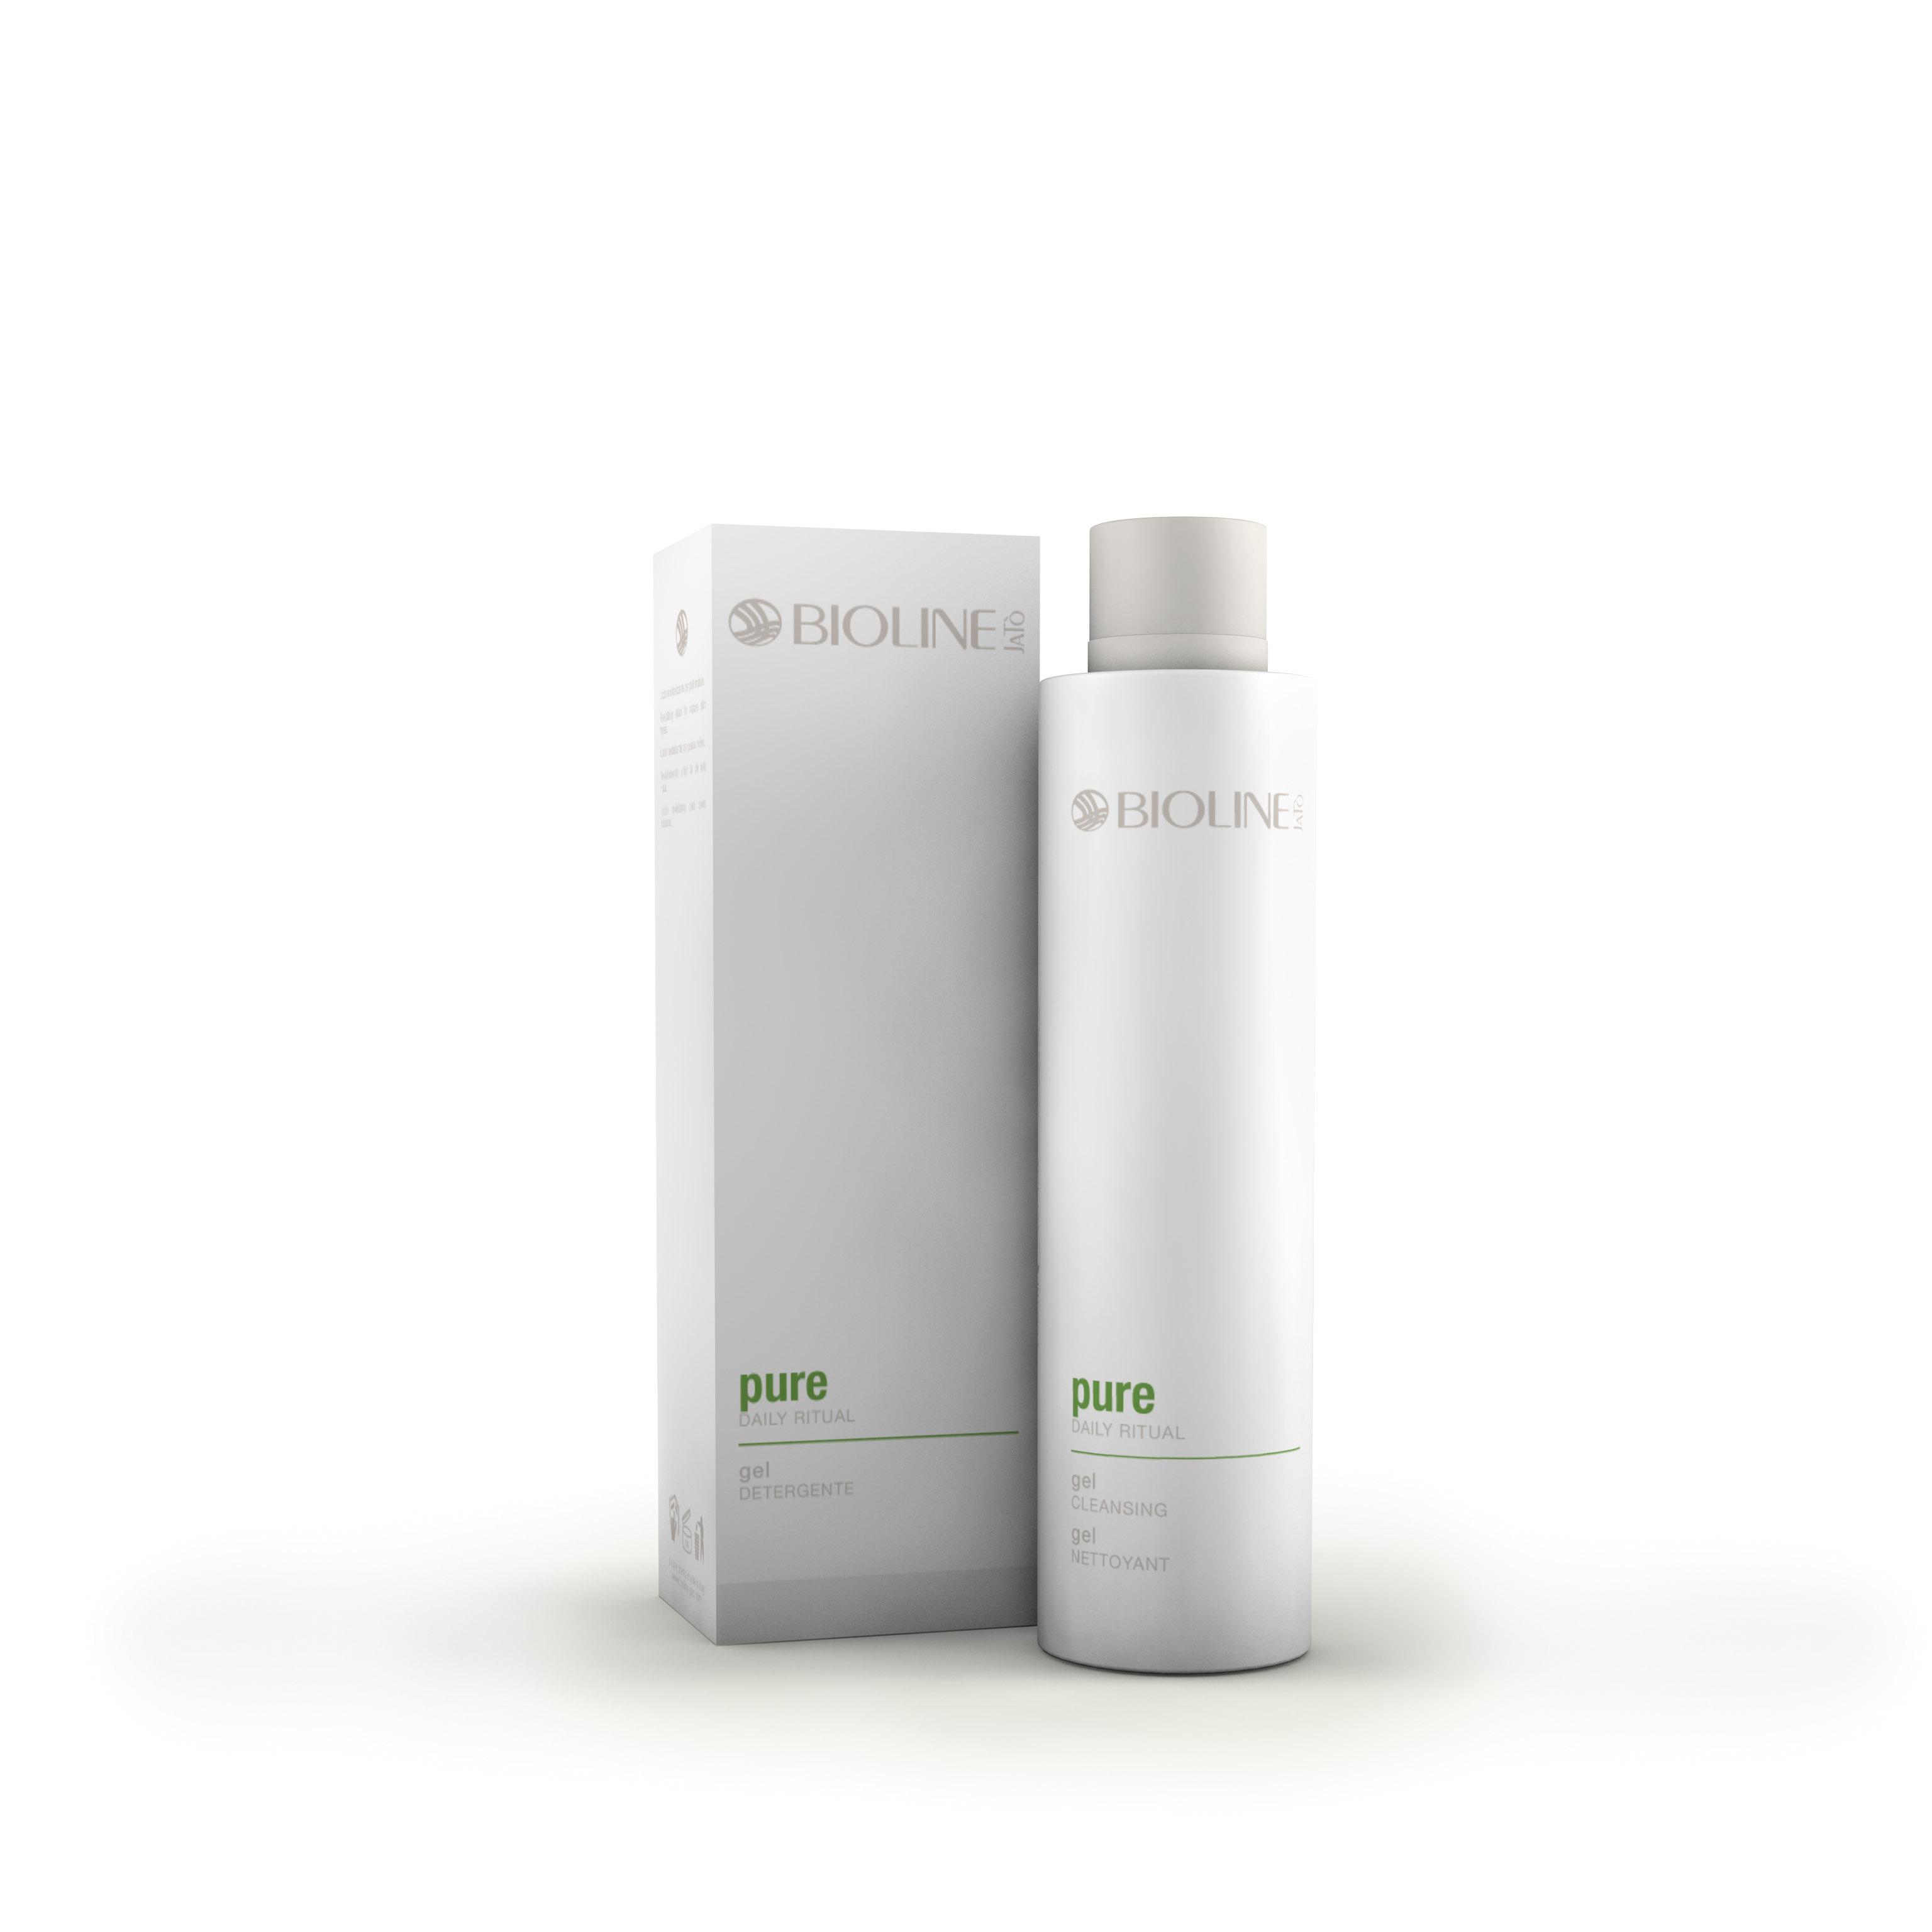 bioline青春净透洁肤胶温和清洁肌肤